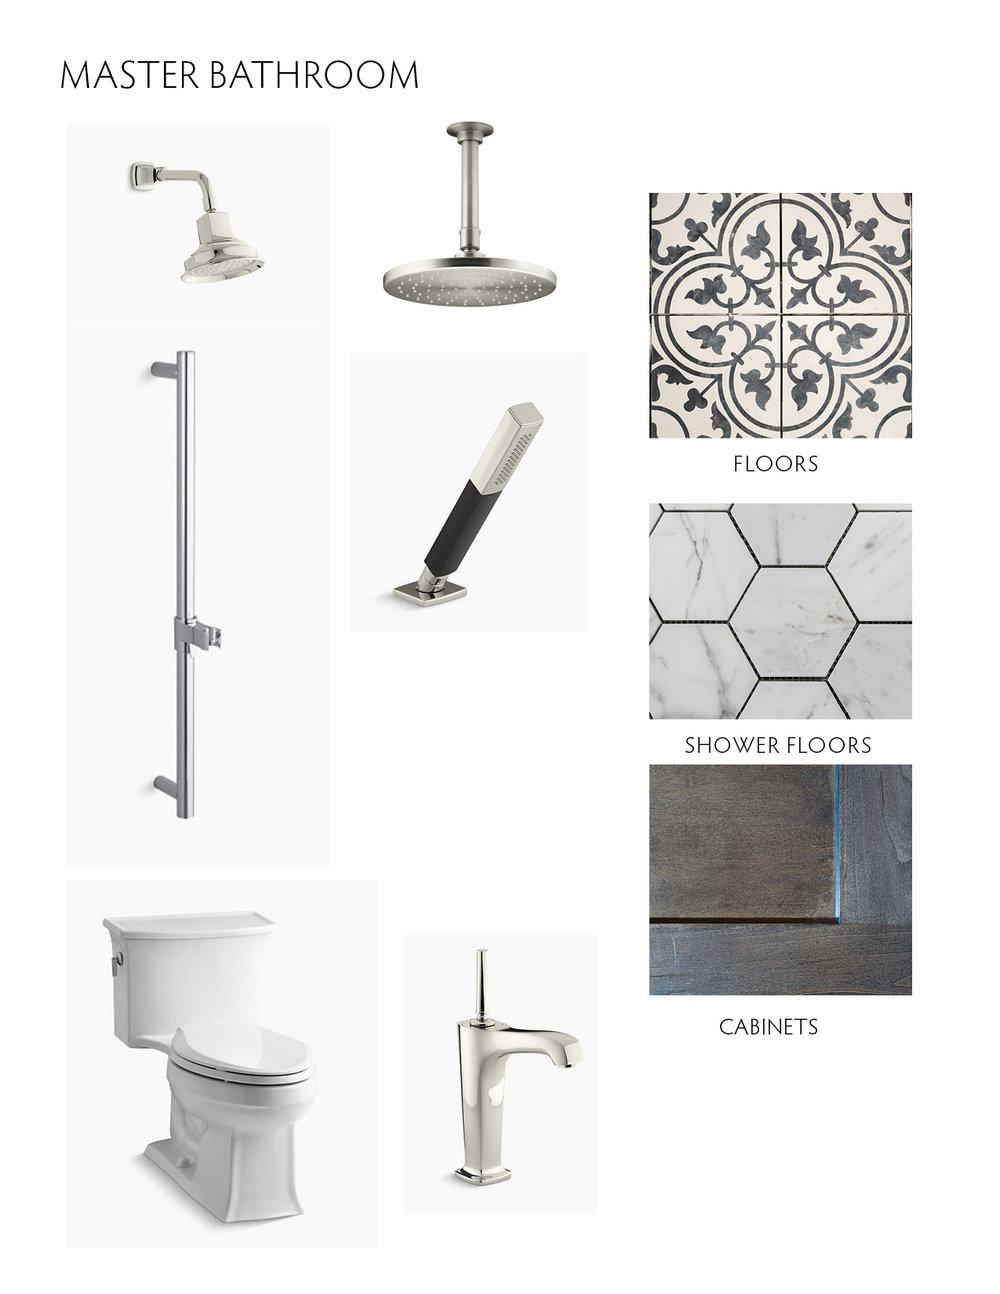 Potomac Master Bathroom.jpg